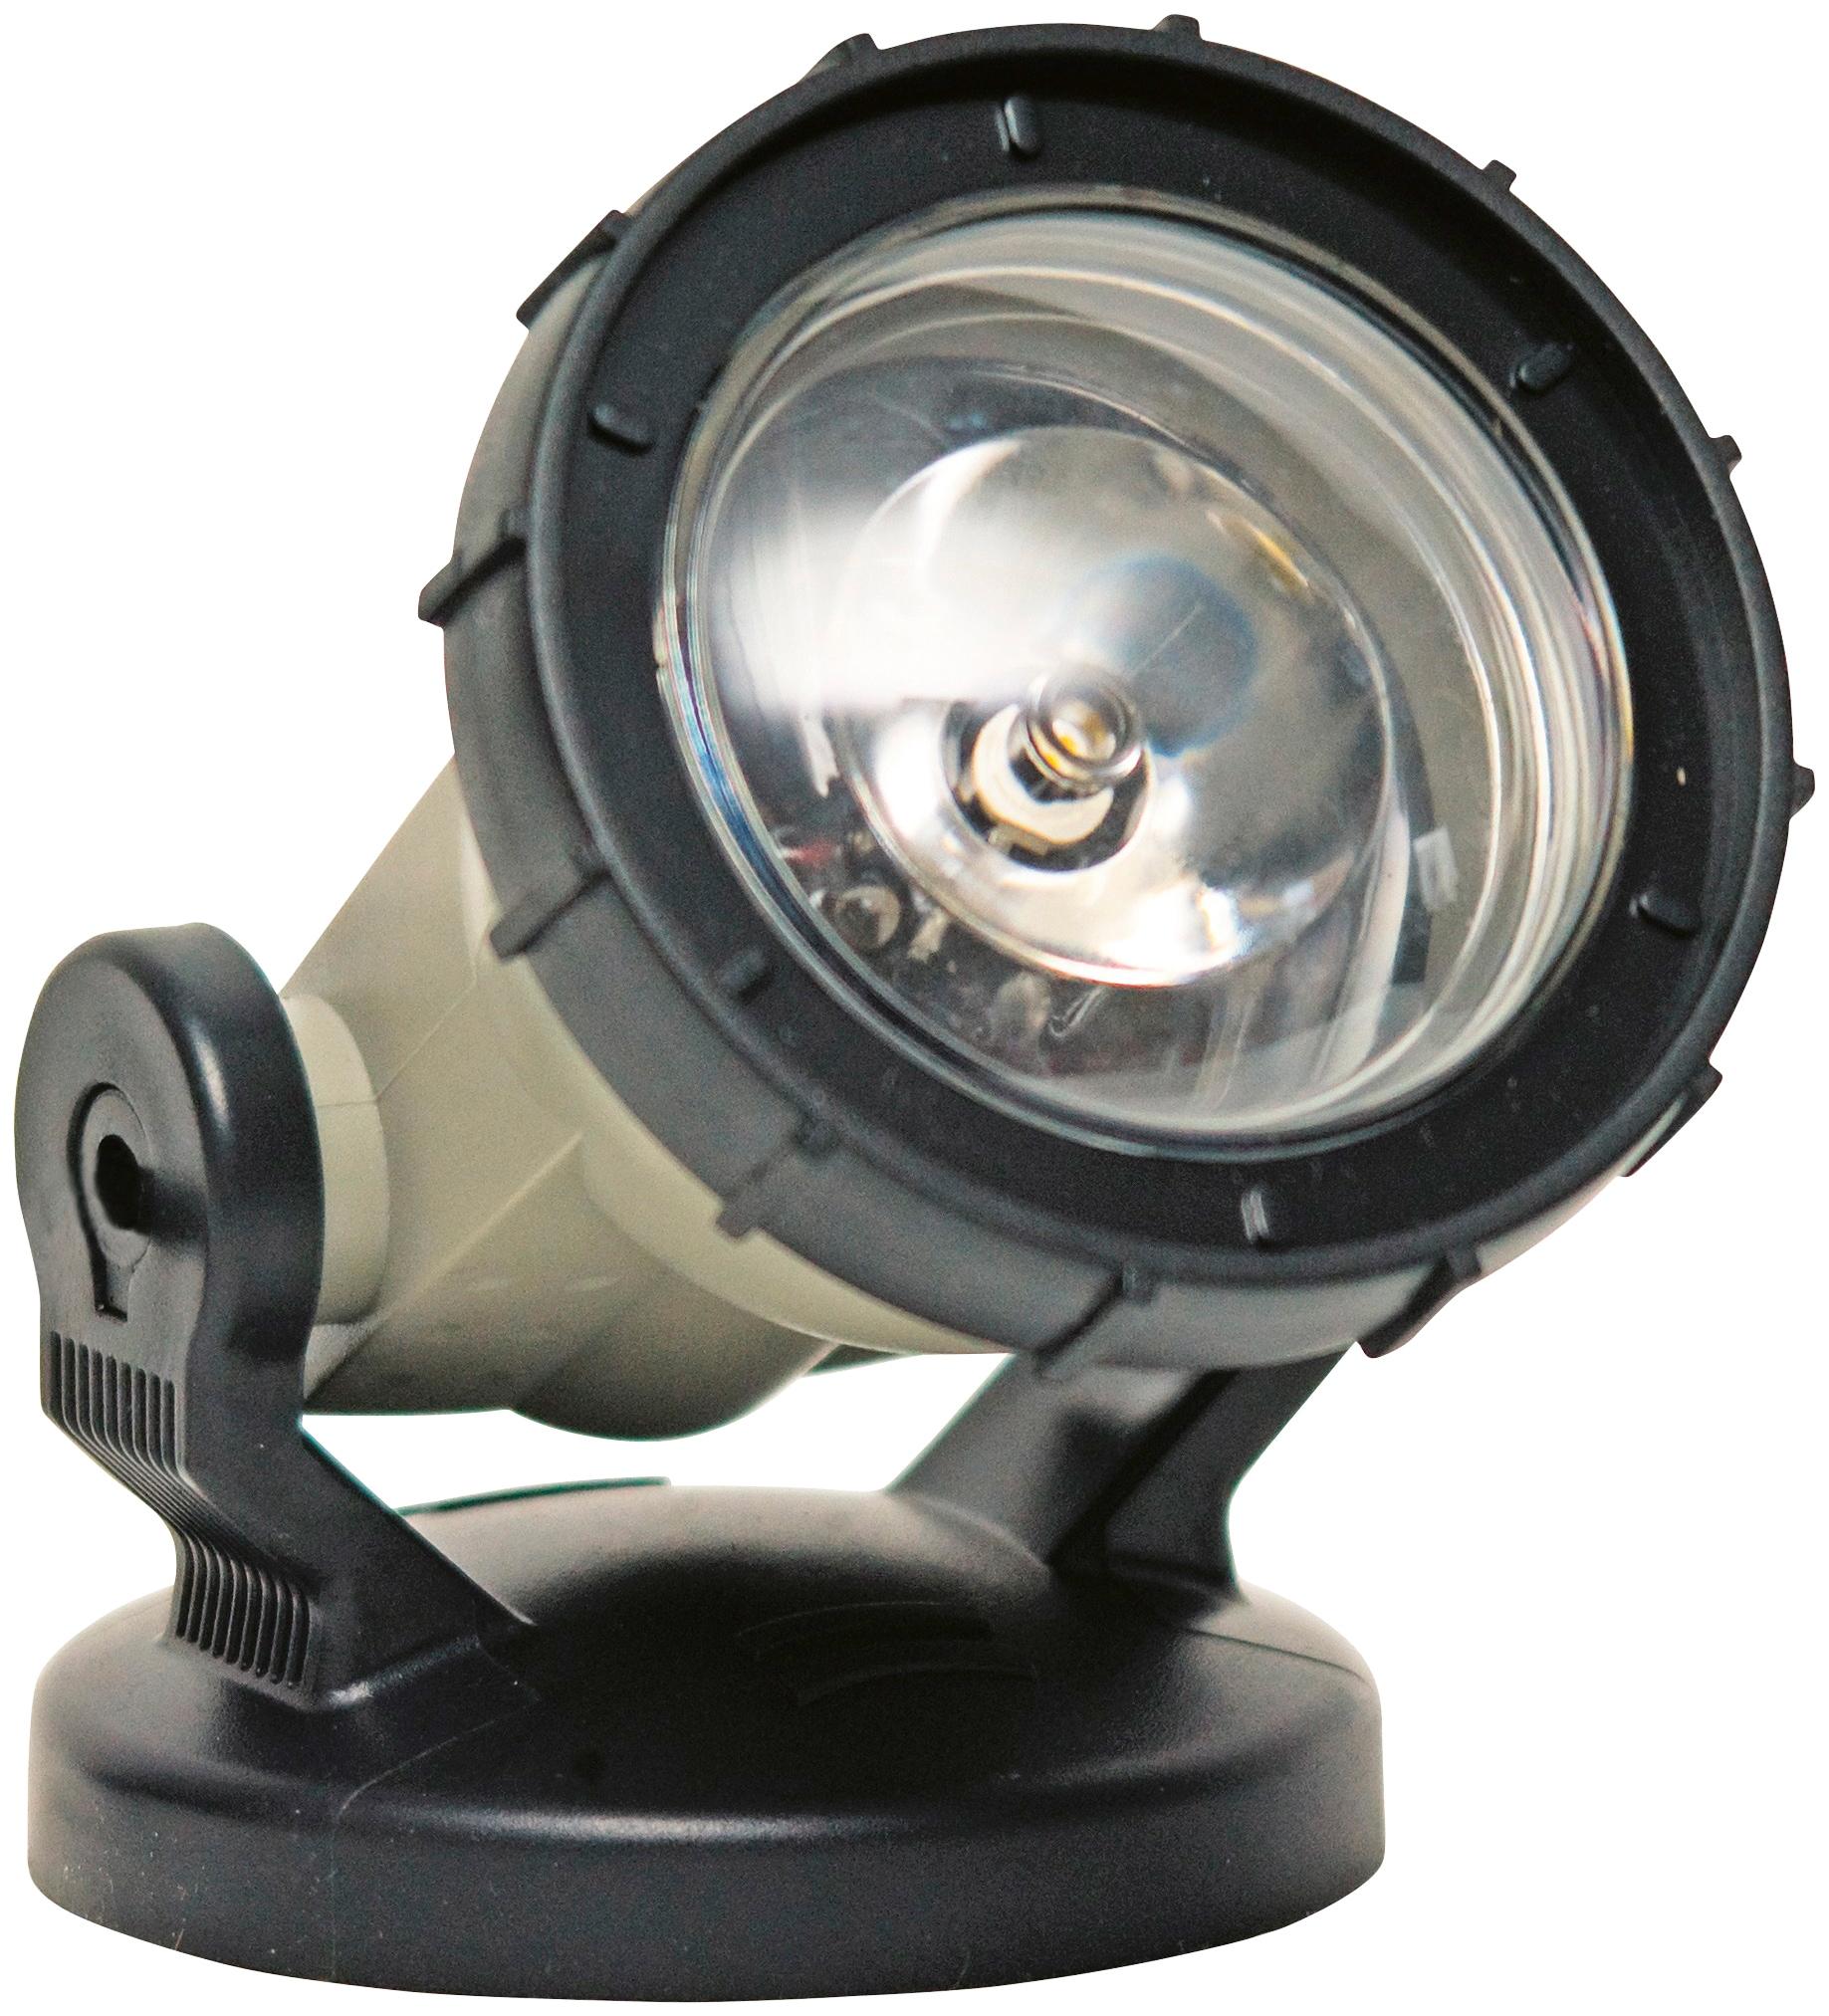 HEISSNER LED-Strahler U401 High Power, 3 Watt, mit Erdspieß